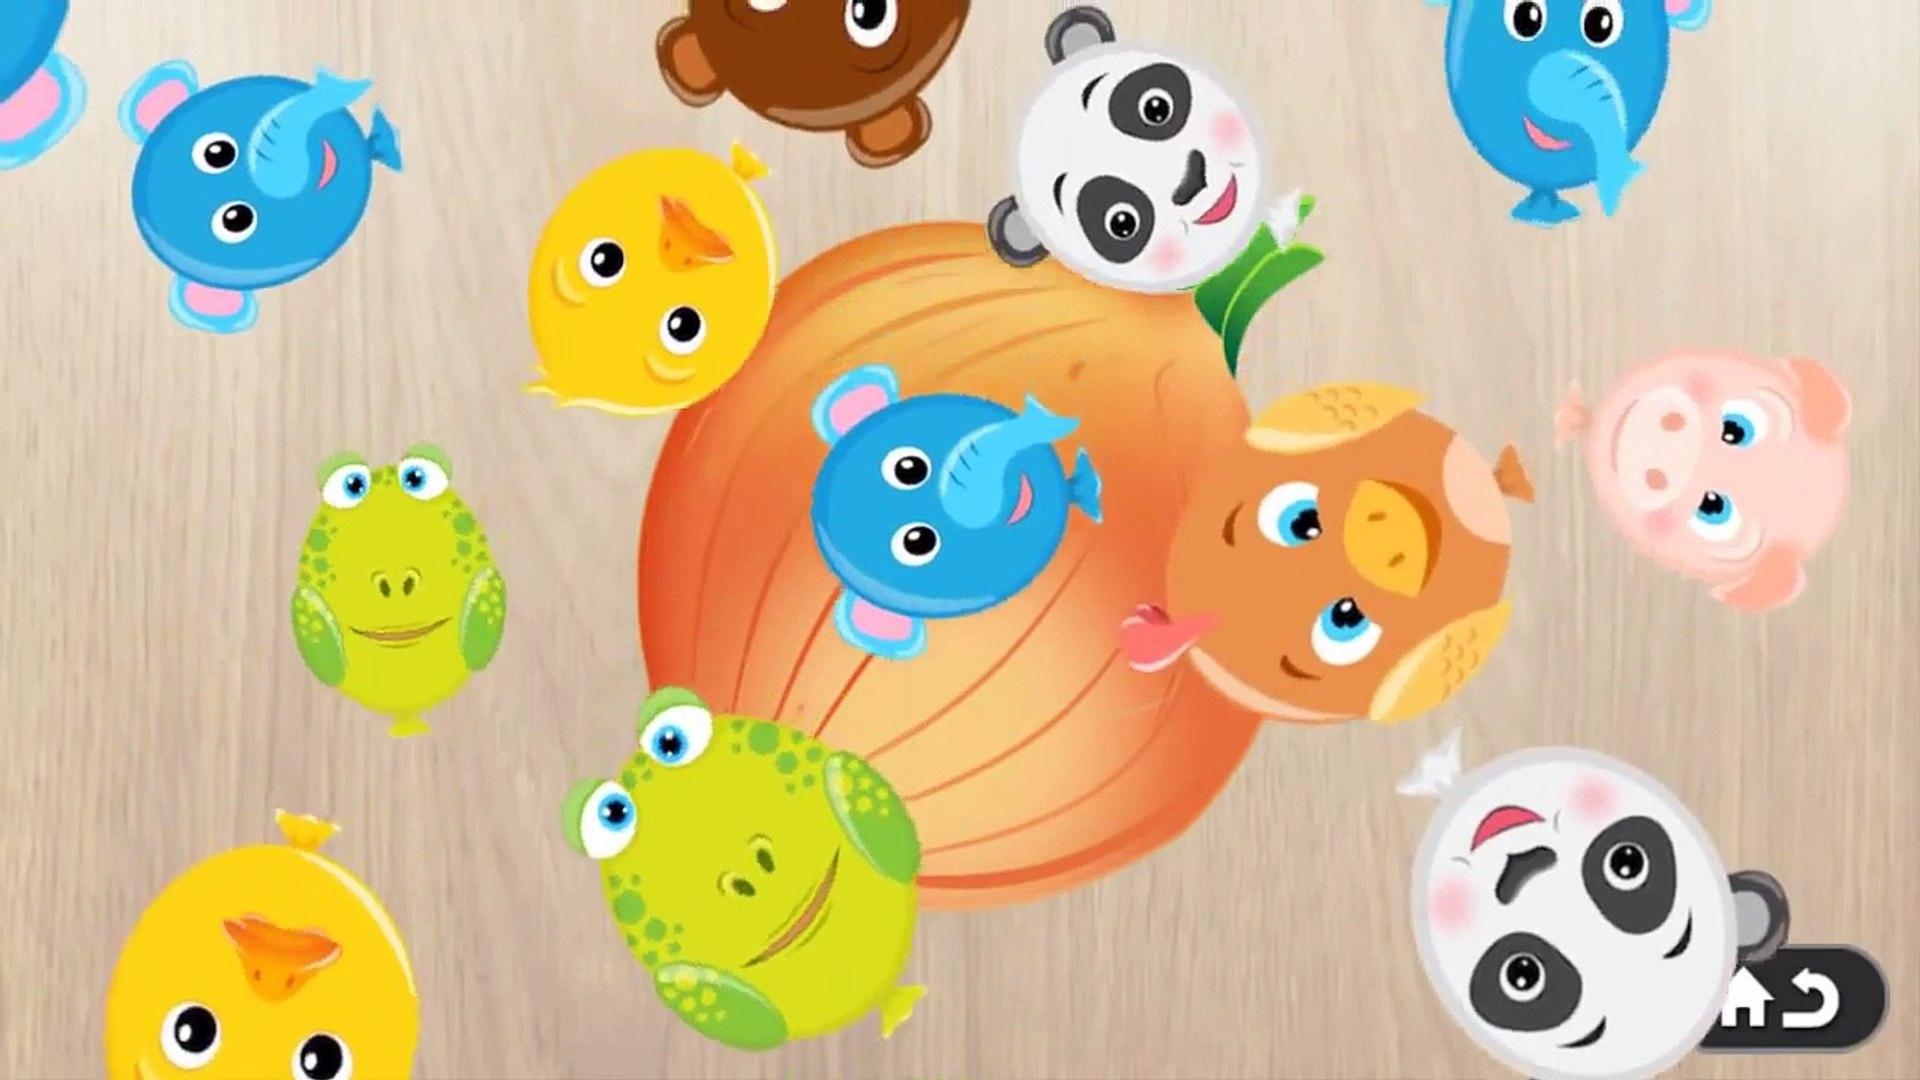 Food Puzzle for Kids   Education App Game video for Kids    kidsmamytv